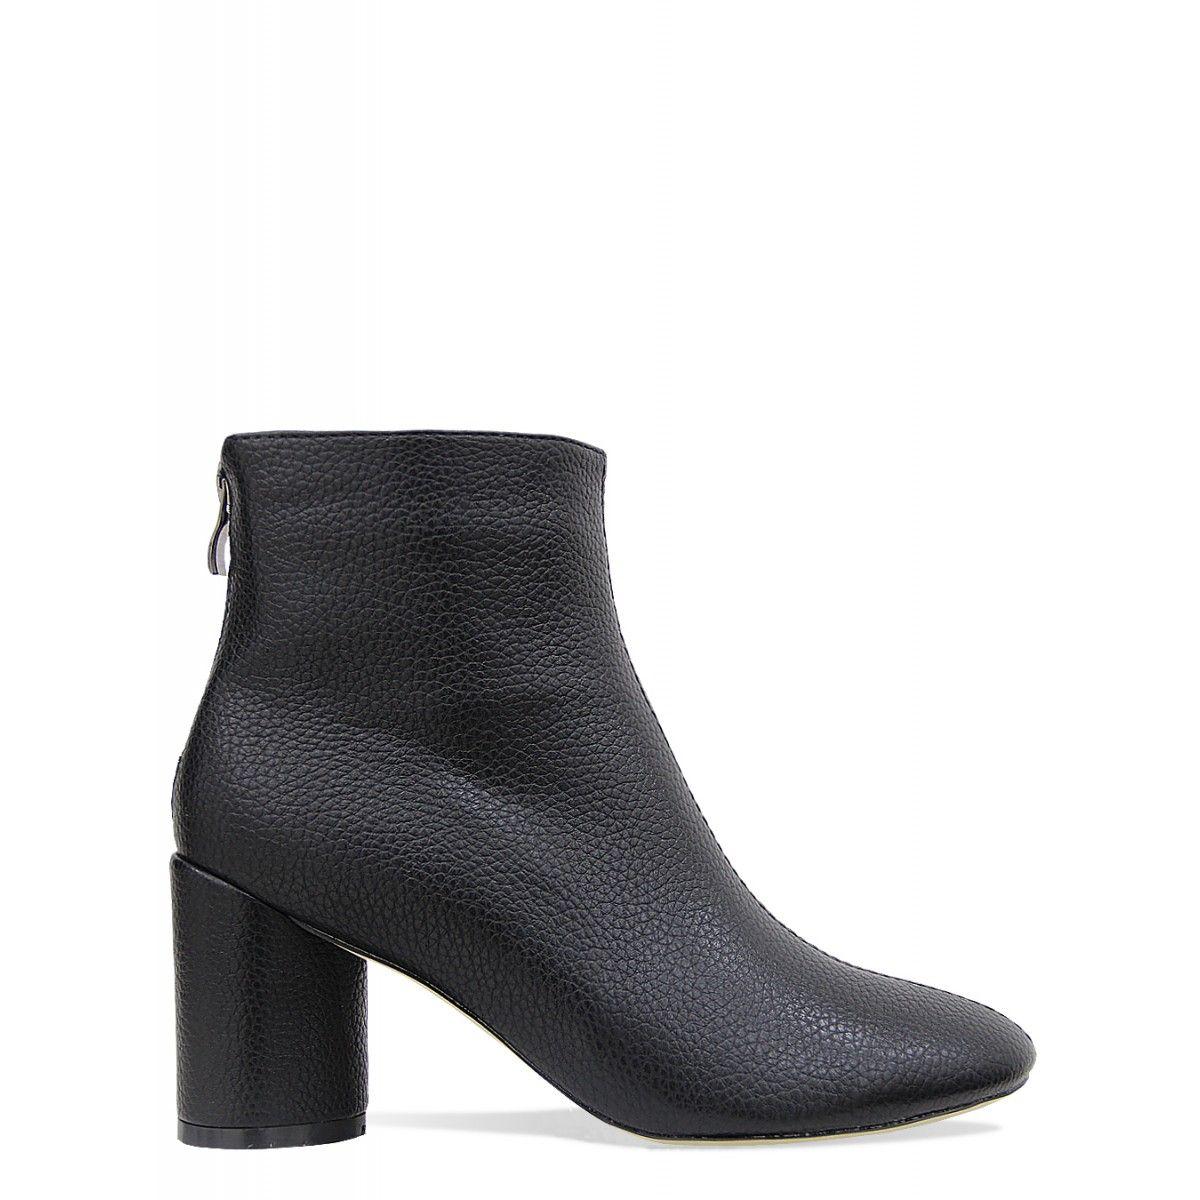 Vanessa Black Block Heel Ankle Boots : Simmi Shoes